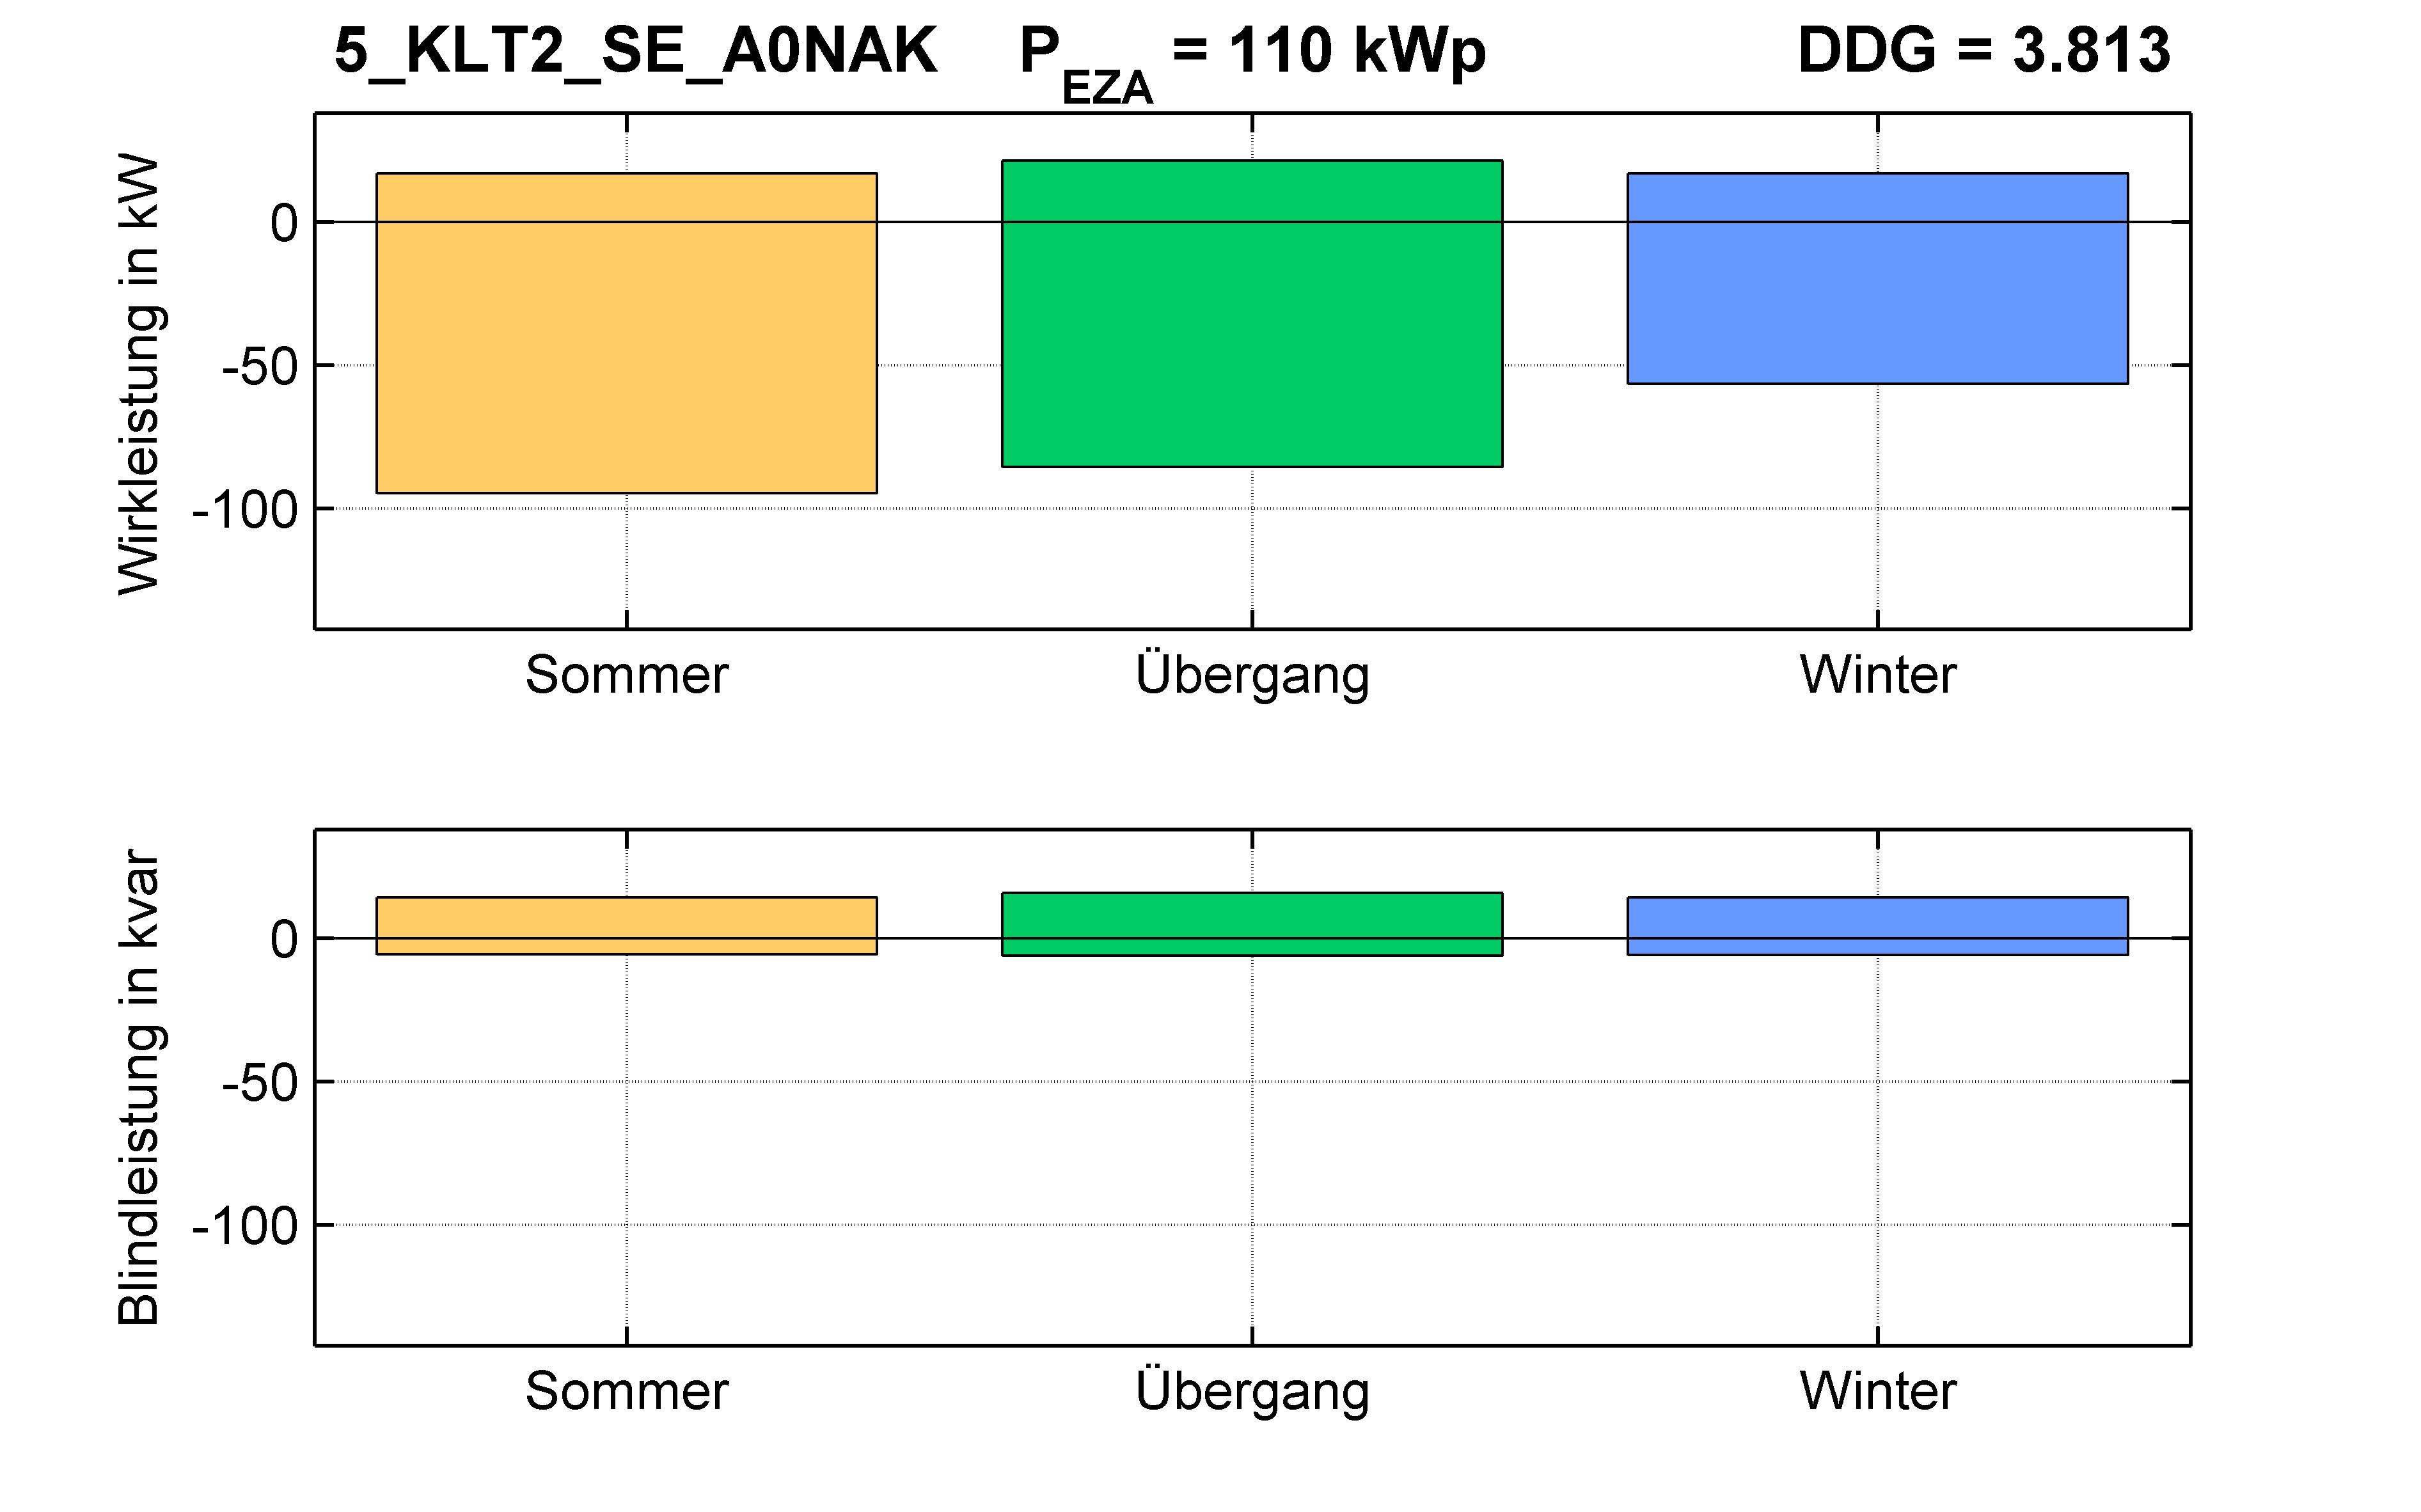 KLT2 | STATION (SE) A0NAK | PQ-Bilanz